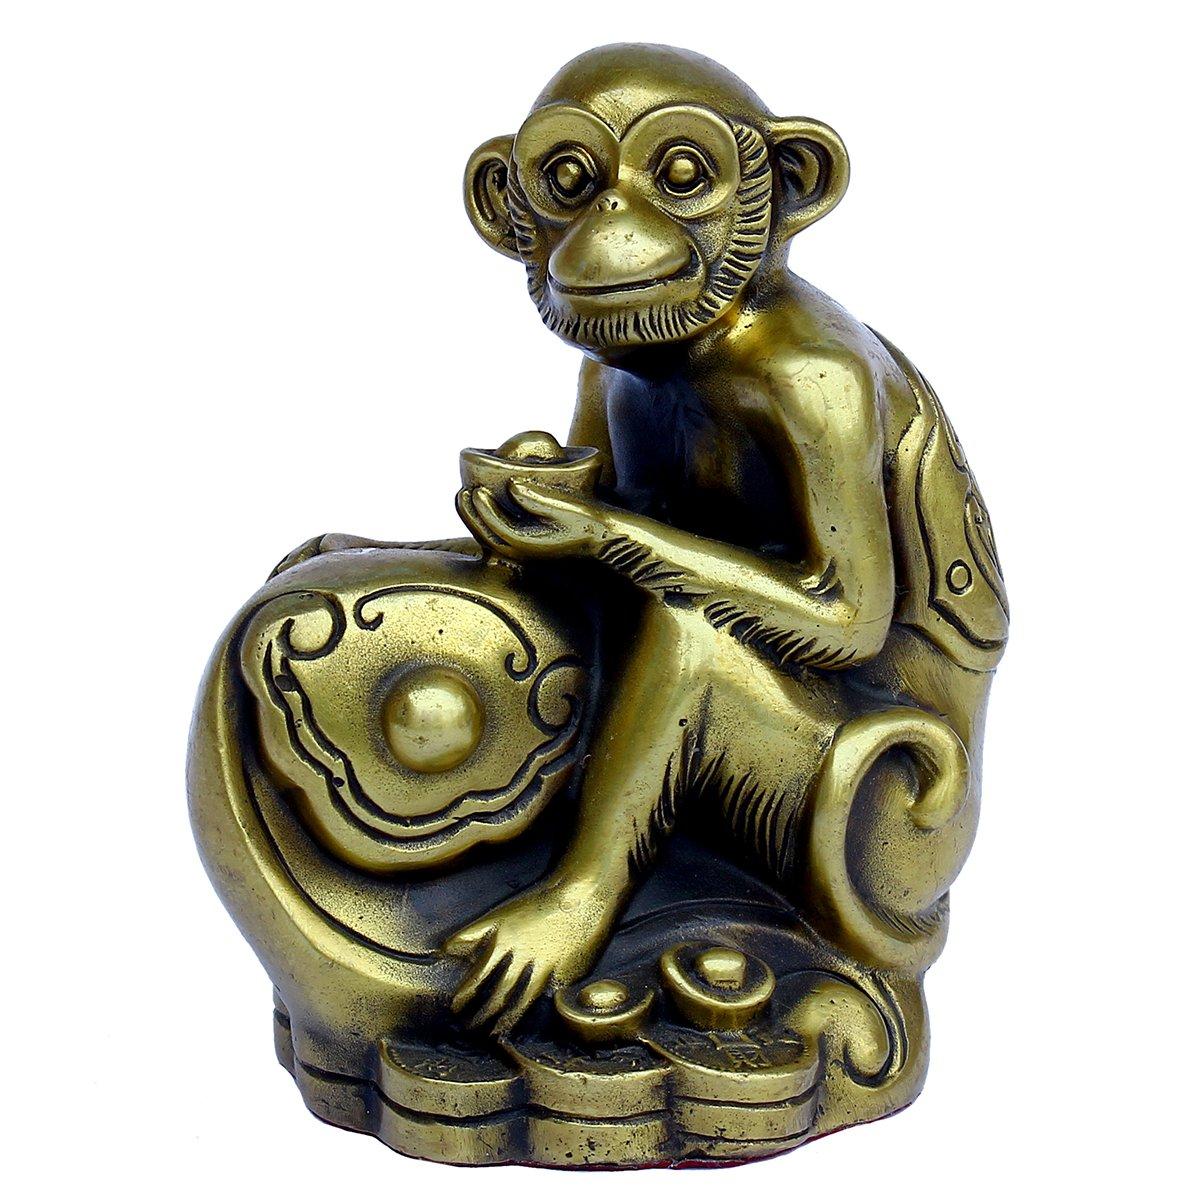 Handmade Chinese Zodiac Series- Brass Monkey Figurine Home Decor Gift